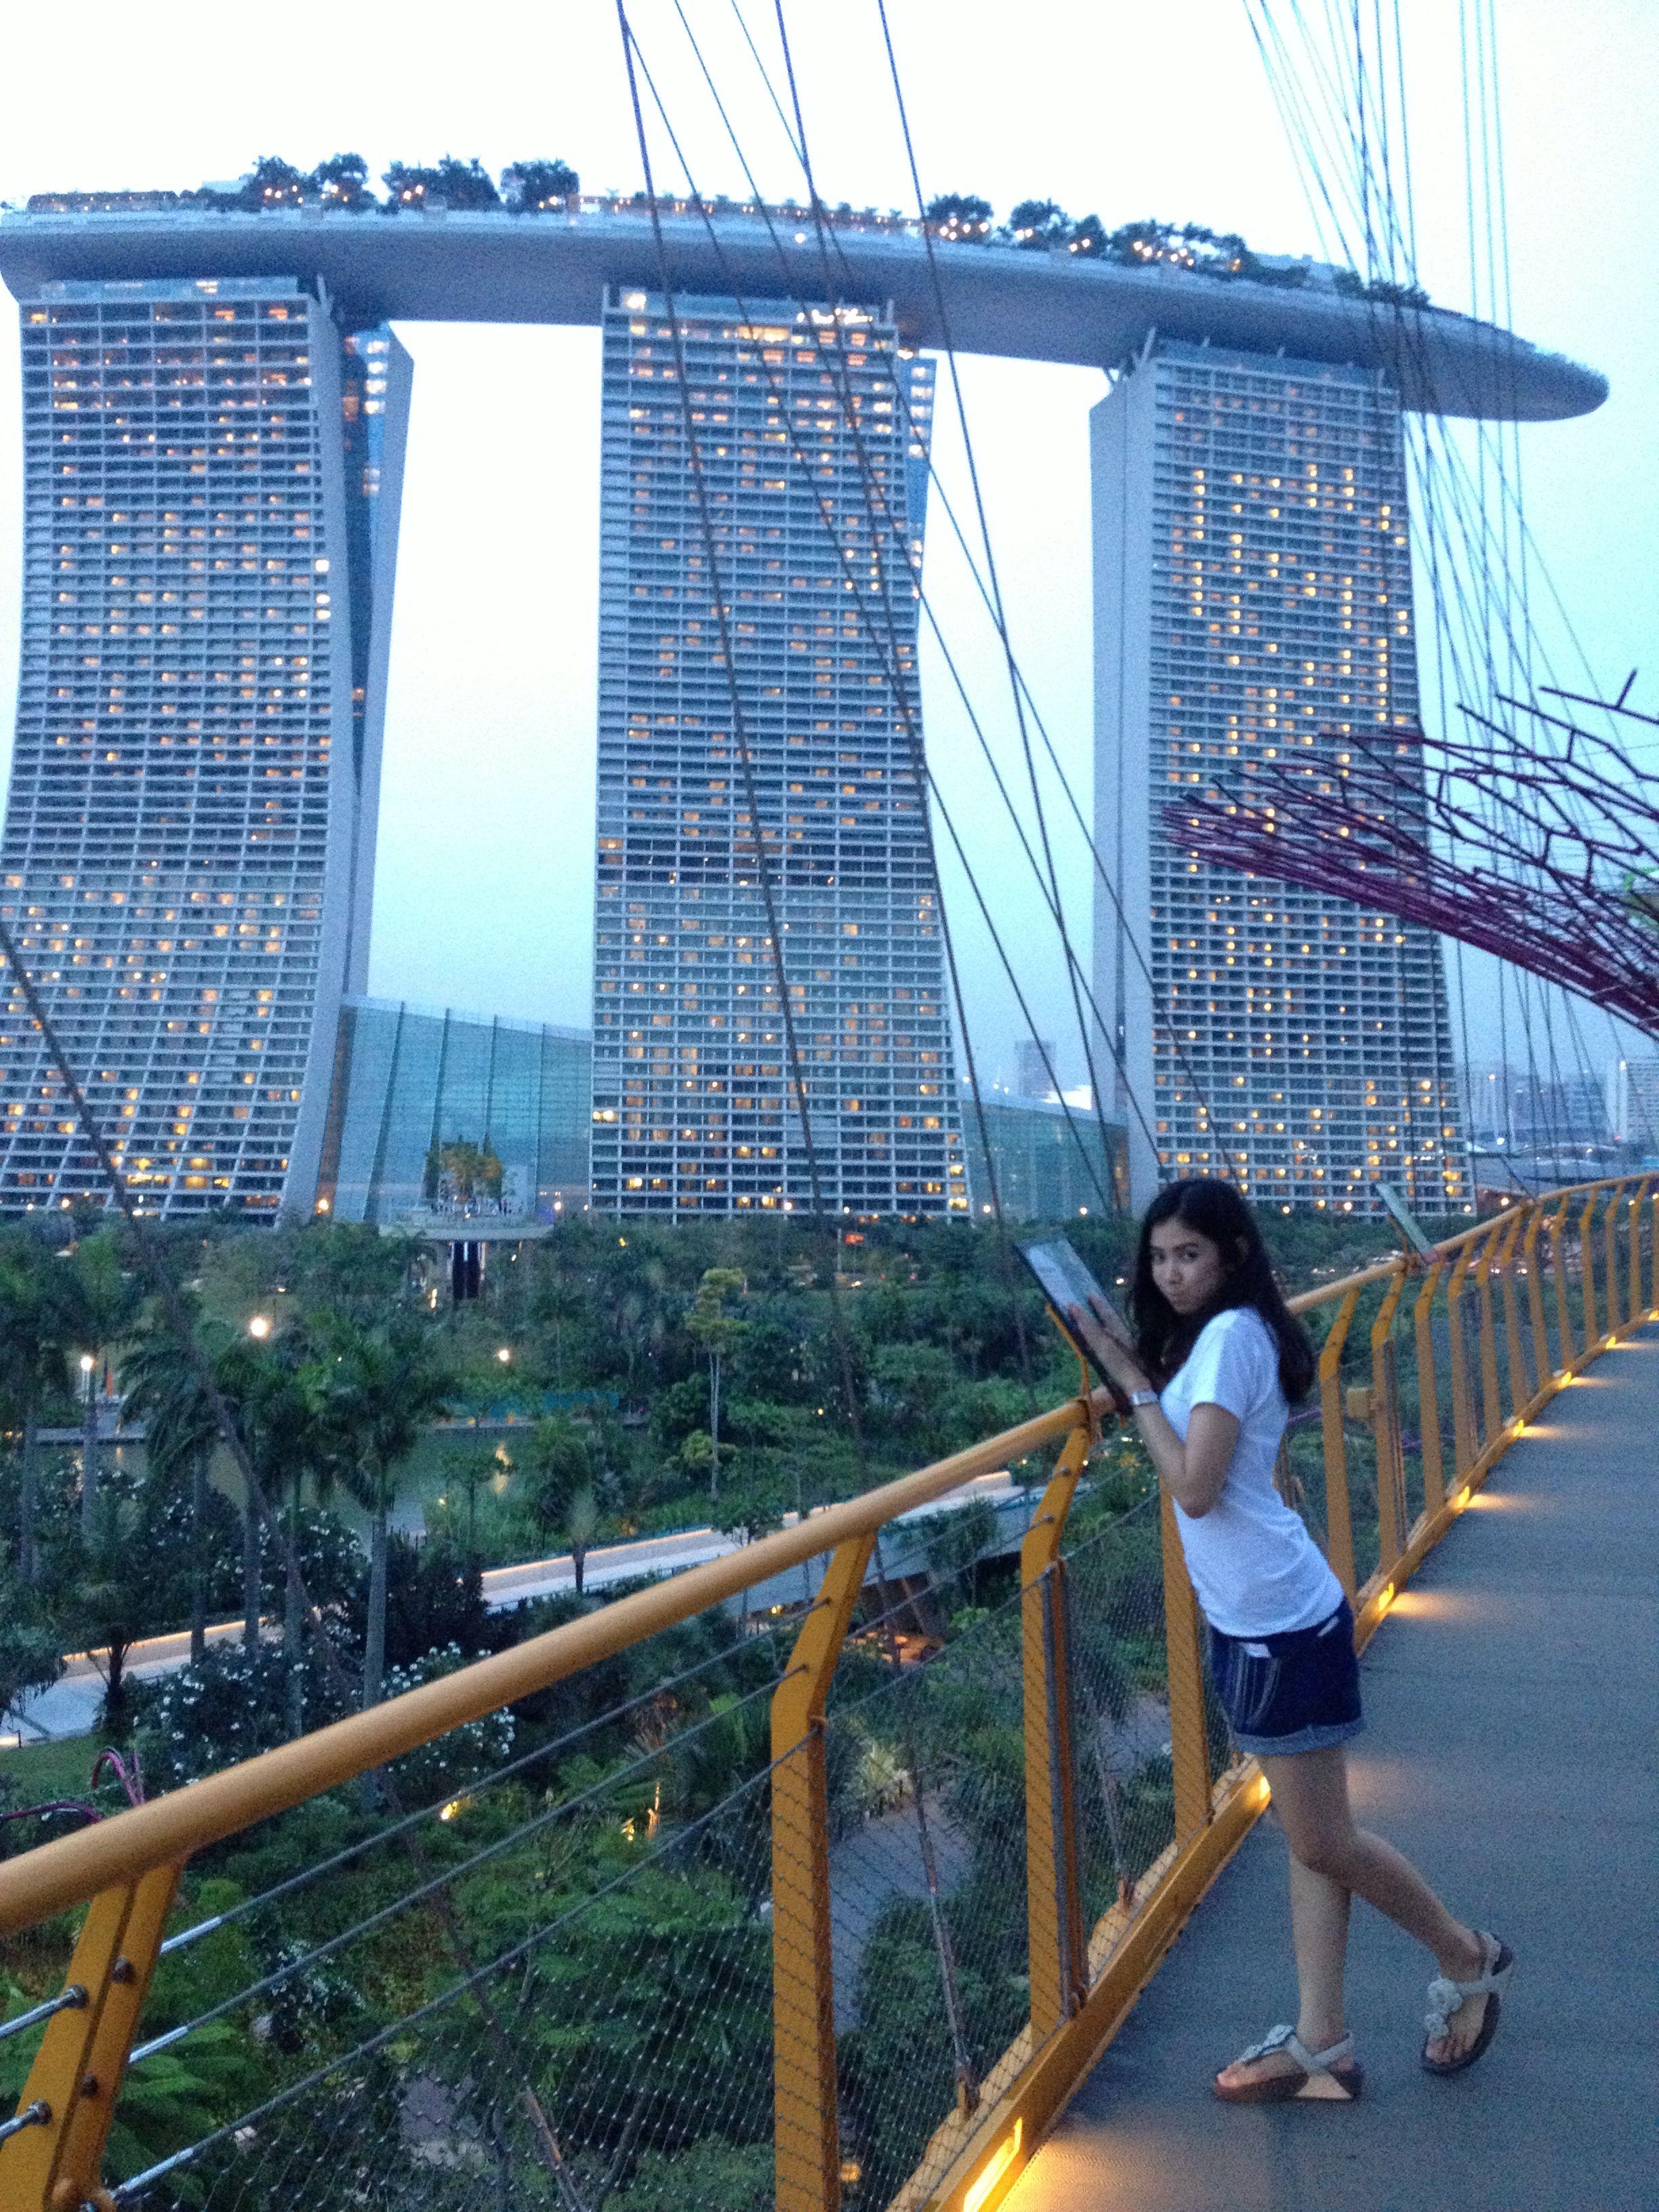 Ocbc Skyway Garden By The Bay Marina South Singapore Marina South Gardens By The Bay Golden Gate Bridge